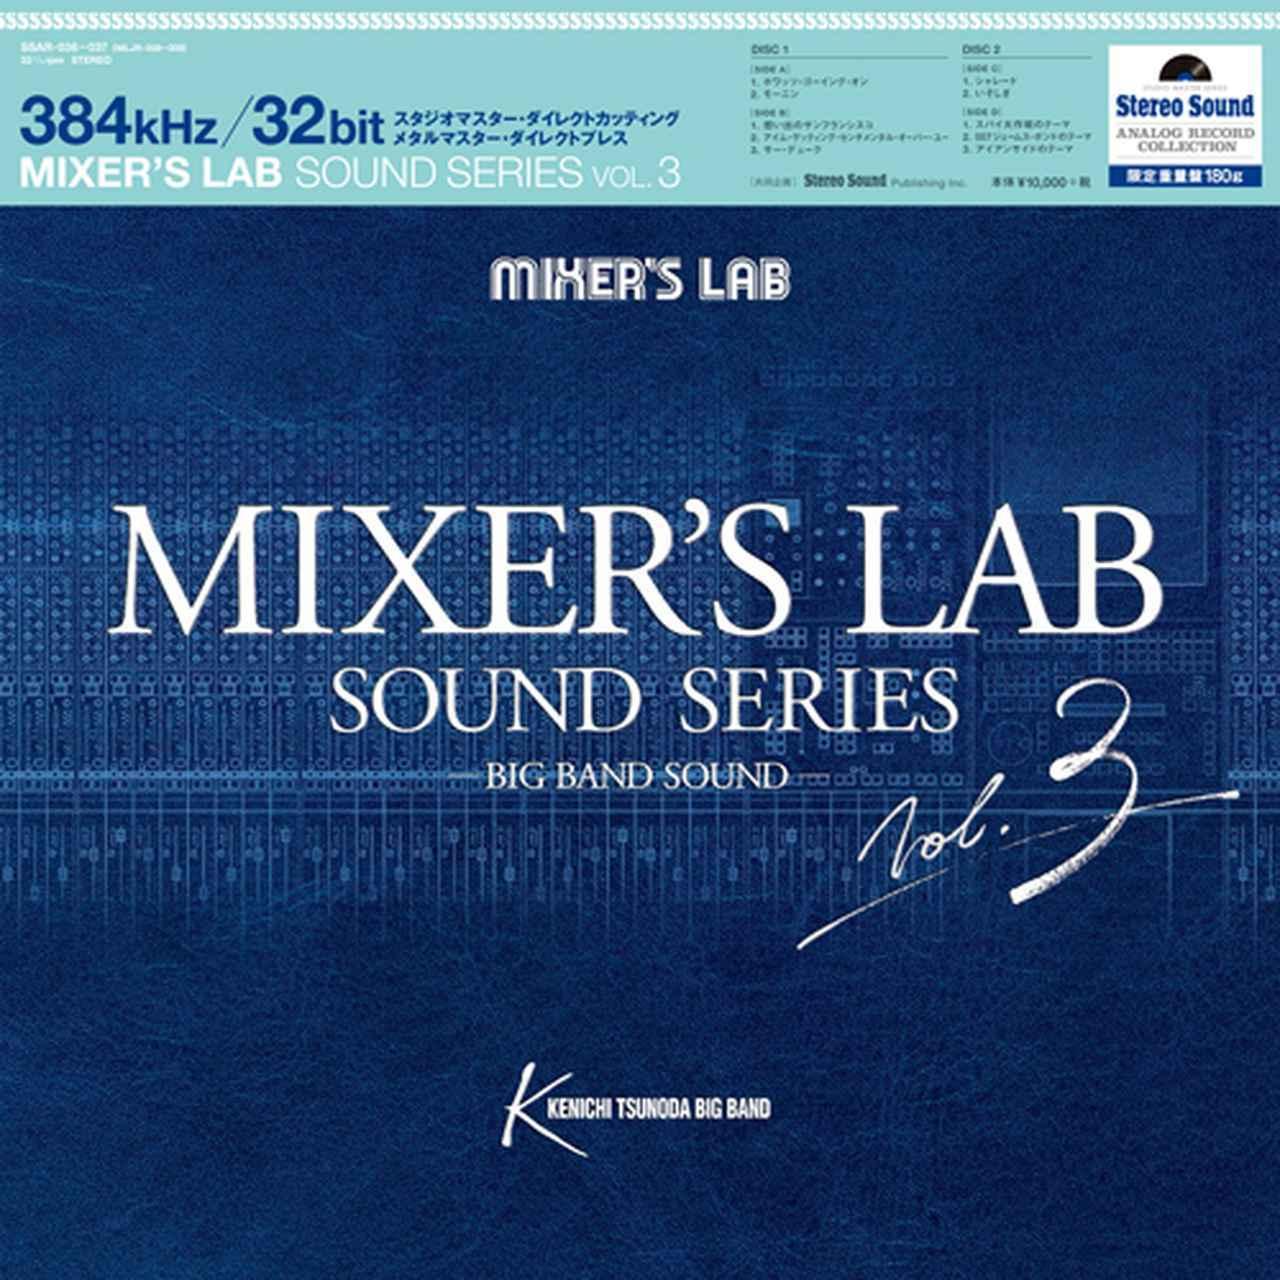 画像: LP MIXER'S LAB SOUND SERIES Vol.3